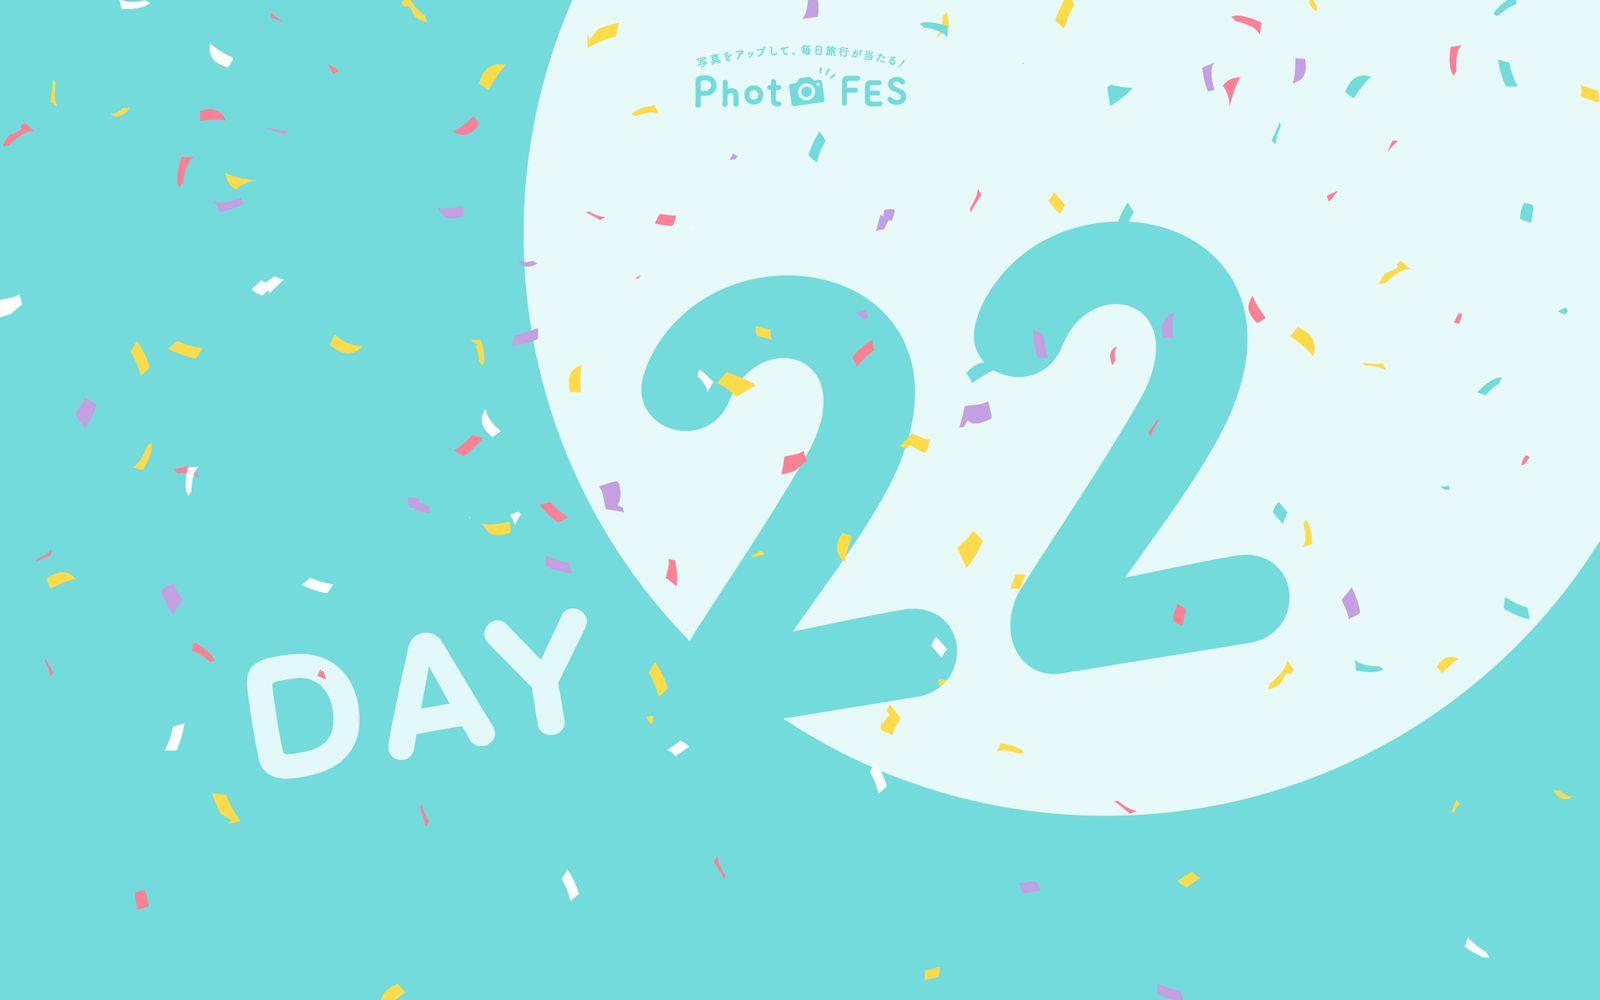 【DAY22】「Photo FES Summer」8月3日投稿分であたる賞品&受賞者発表